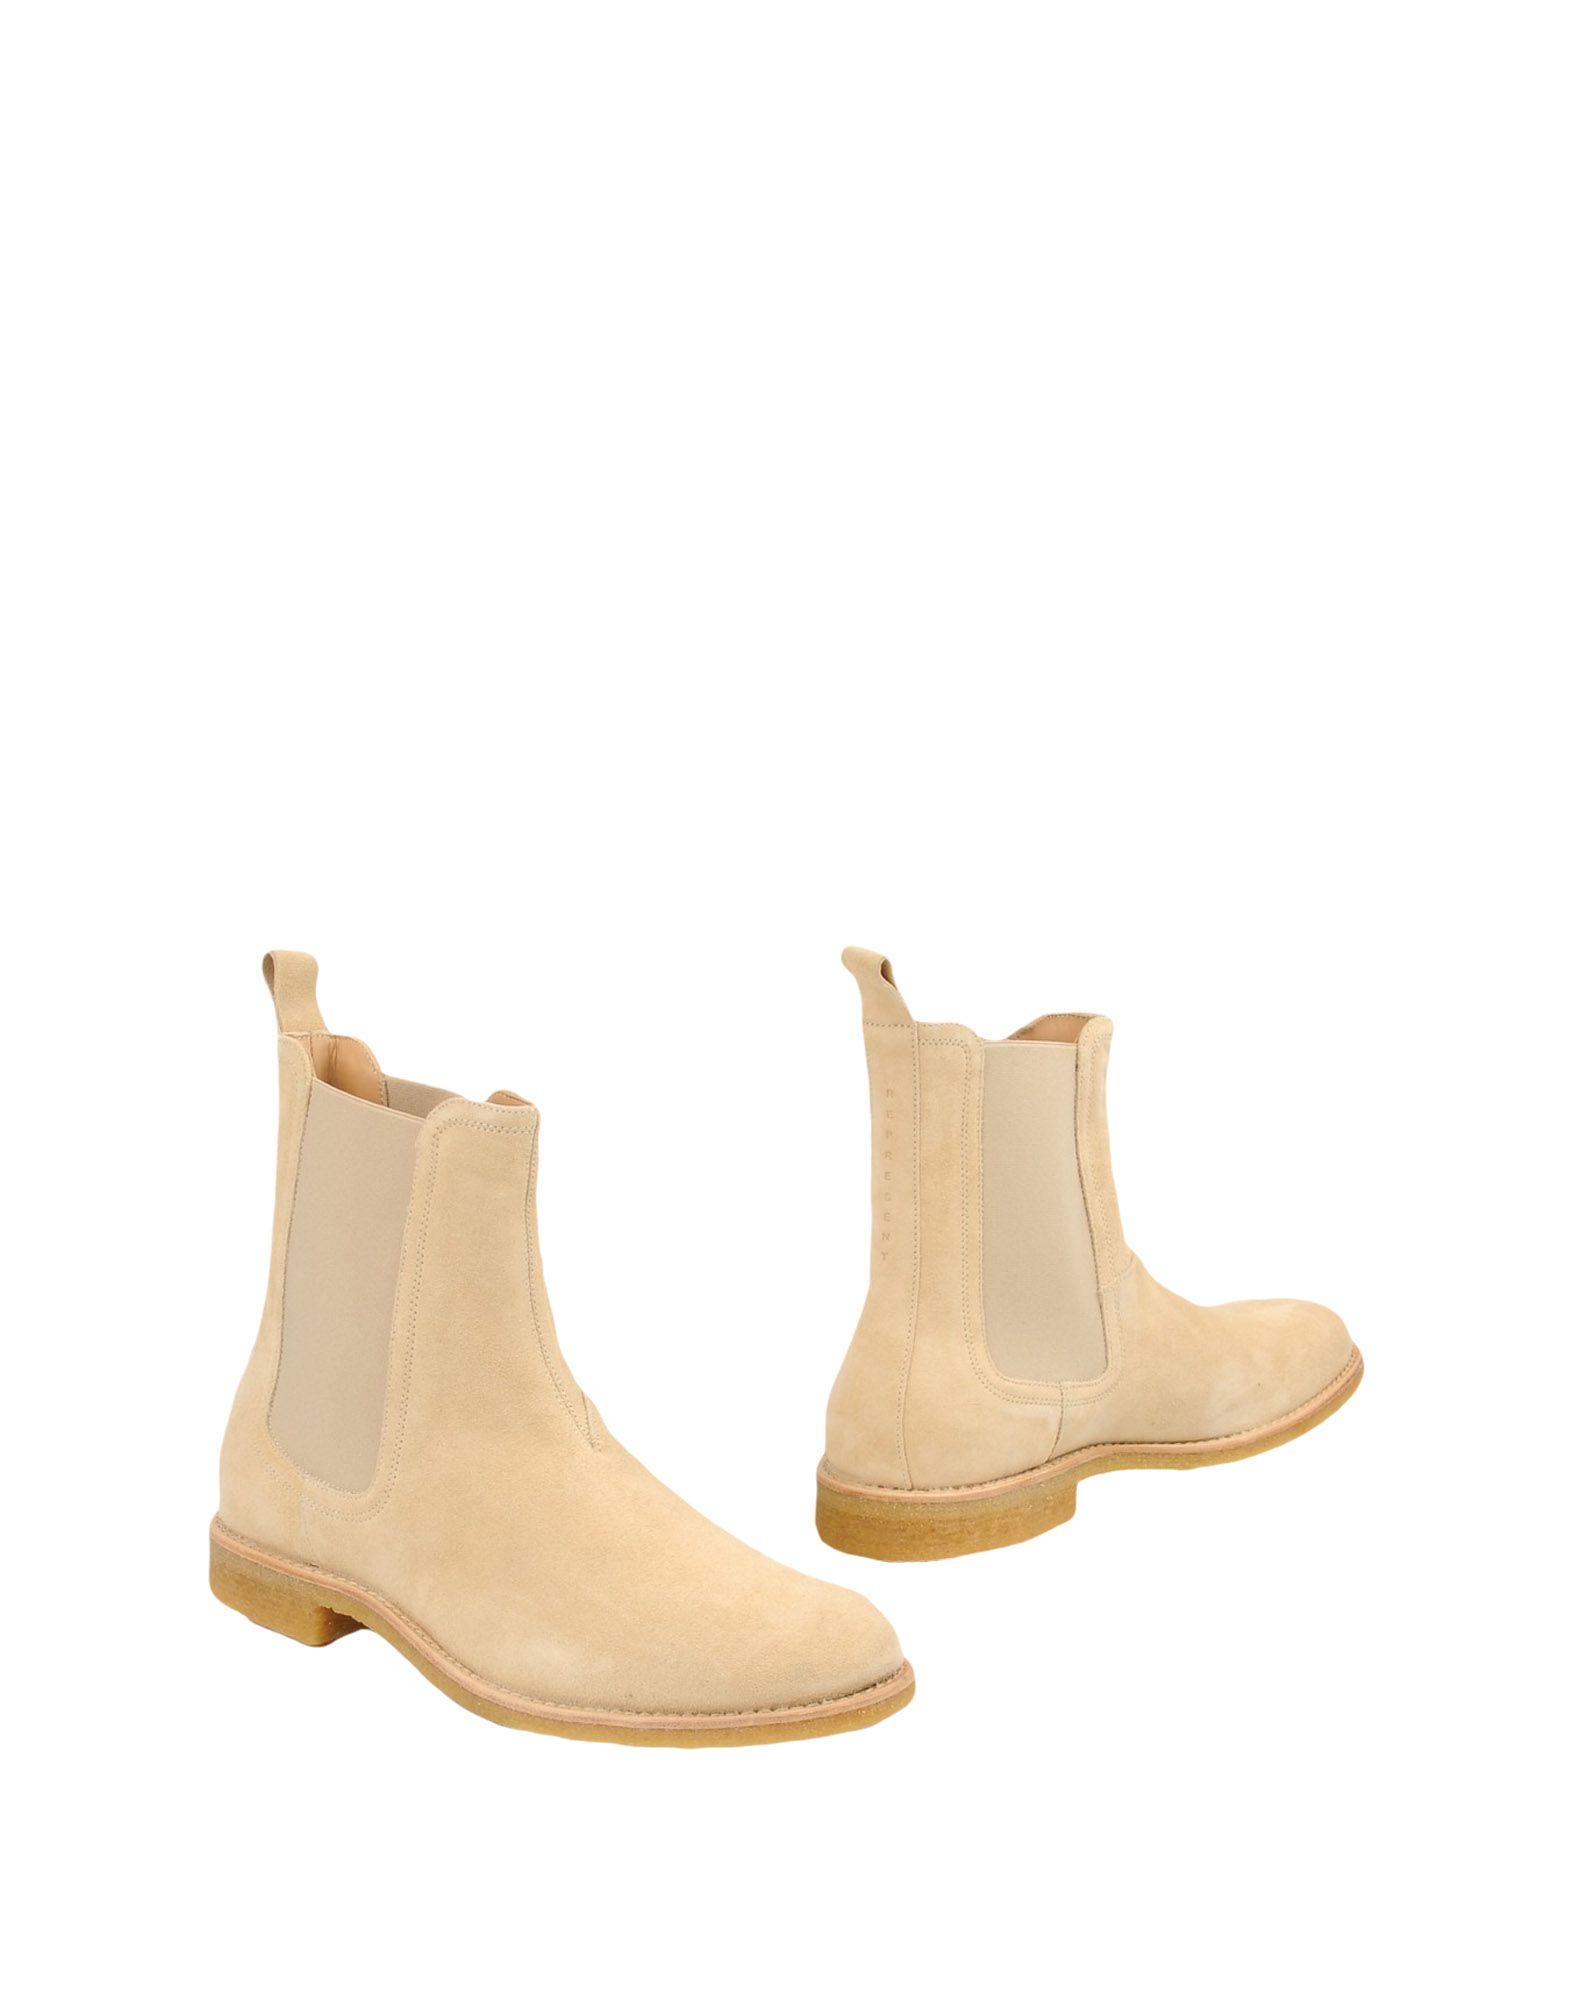 Bottine Represent Chelsea Boot - Homme - Bottines Represent sur